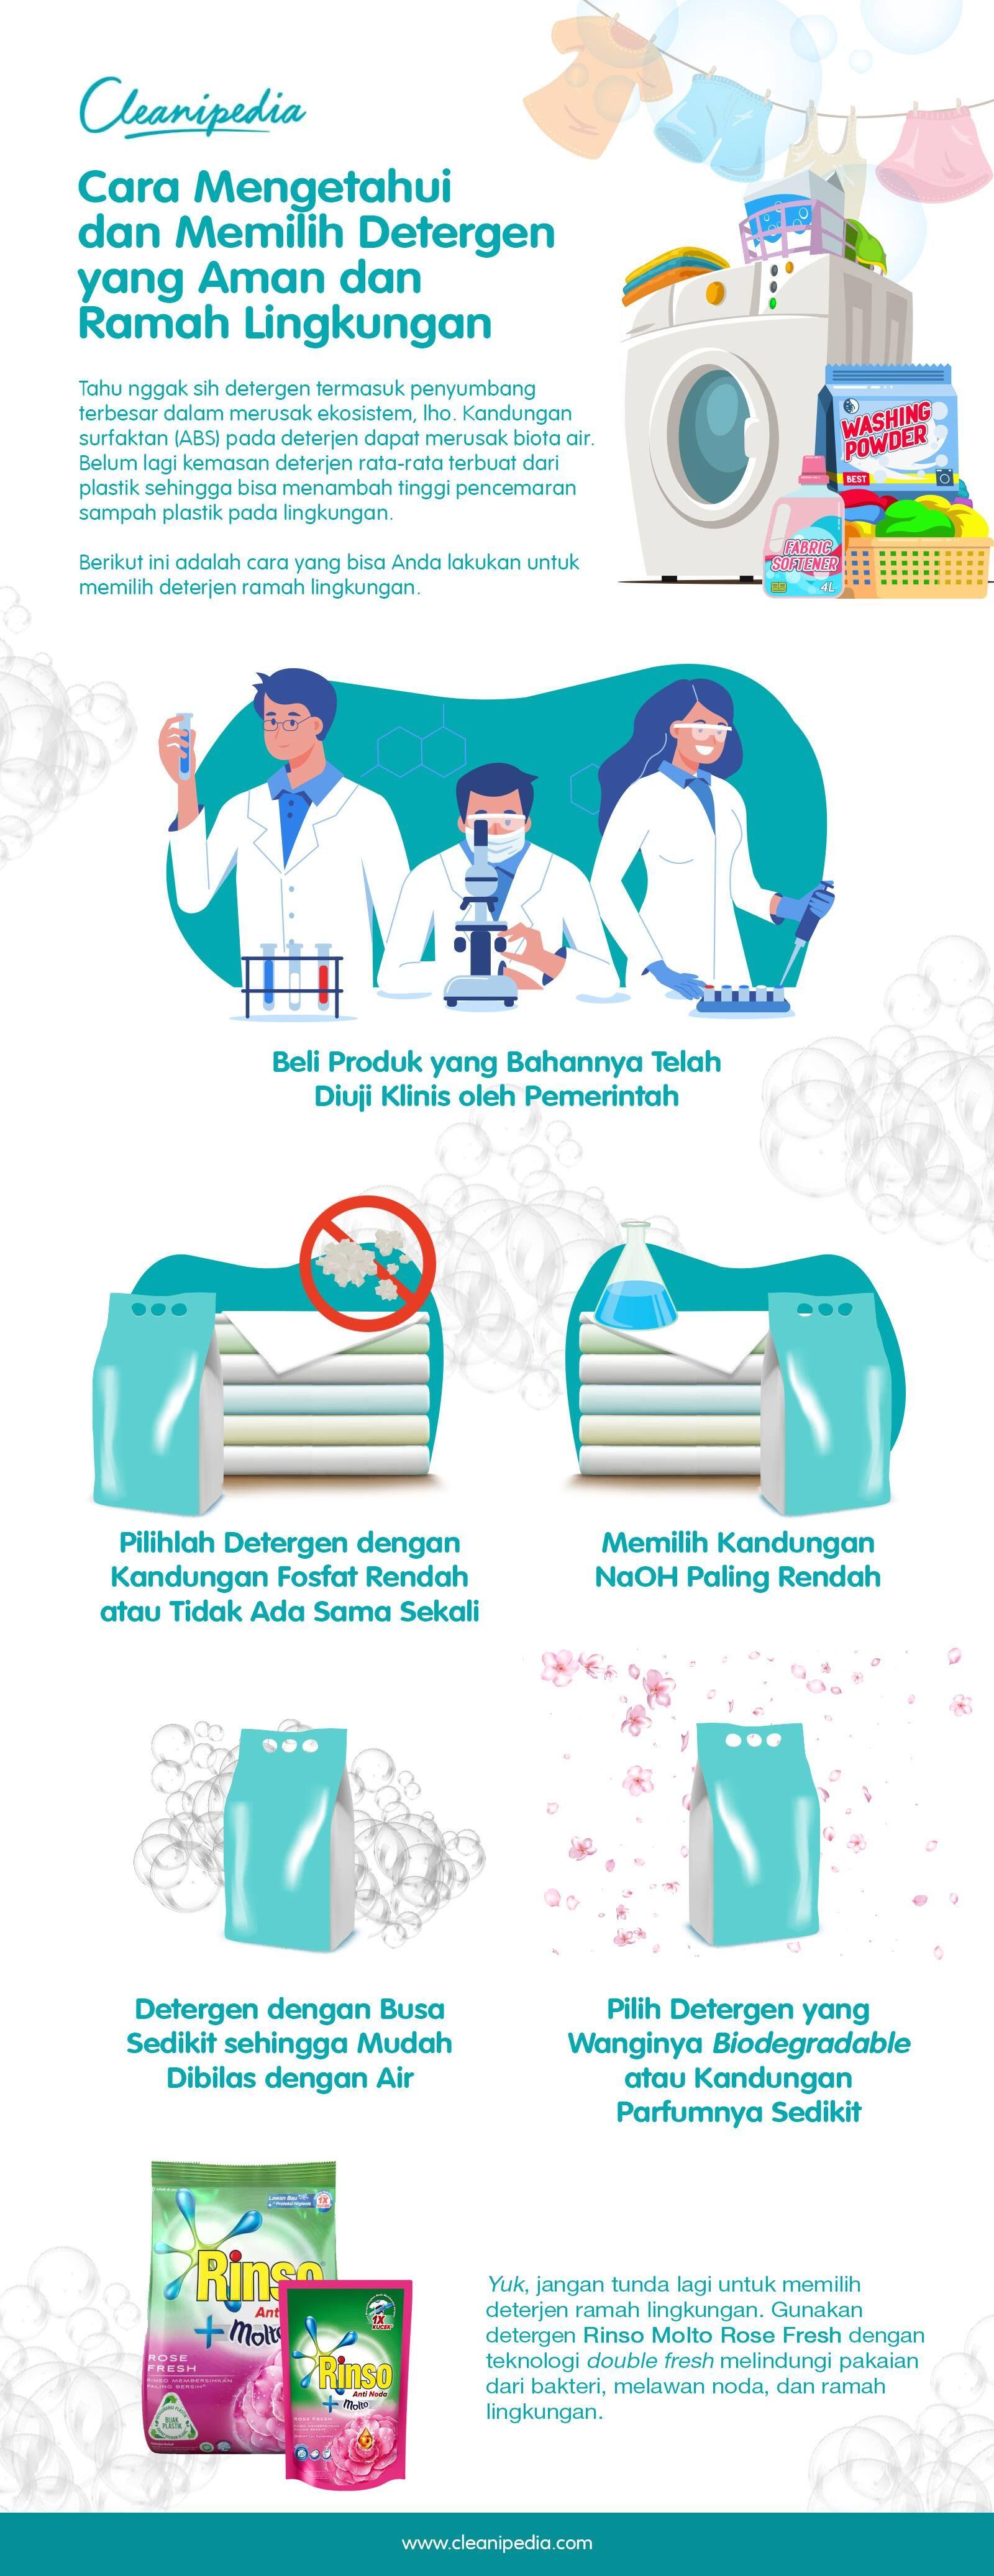 Cara Mengetahui dan Memilih Detergen yang Aman dan Ramah Lingkungan